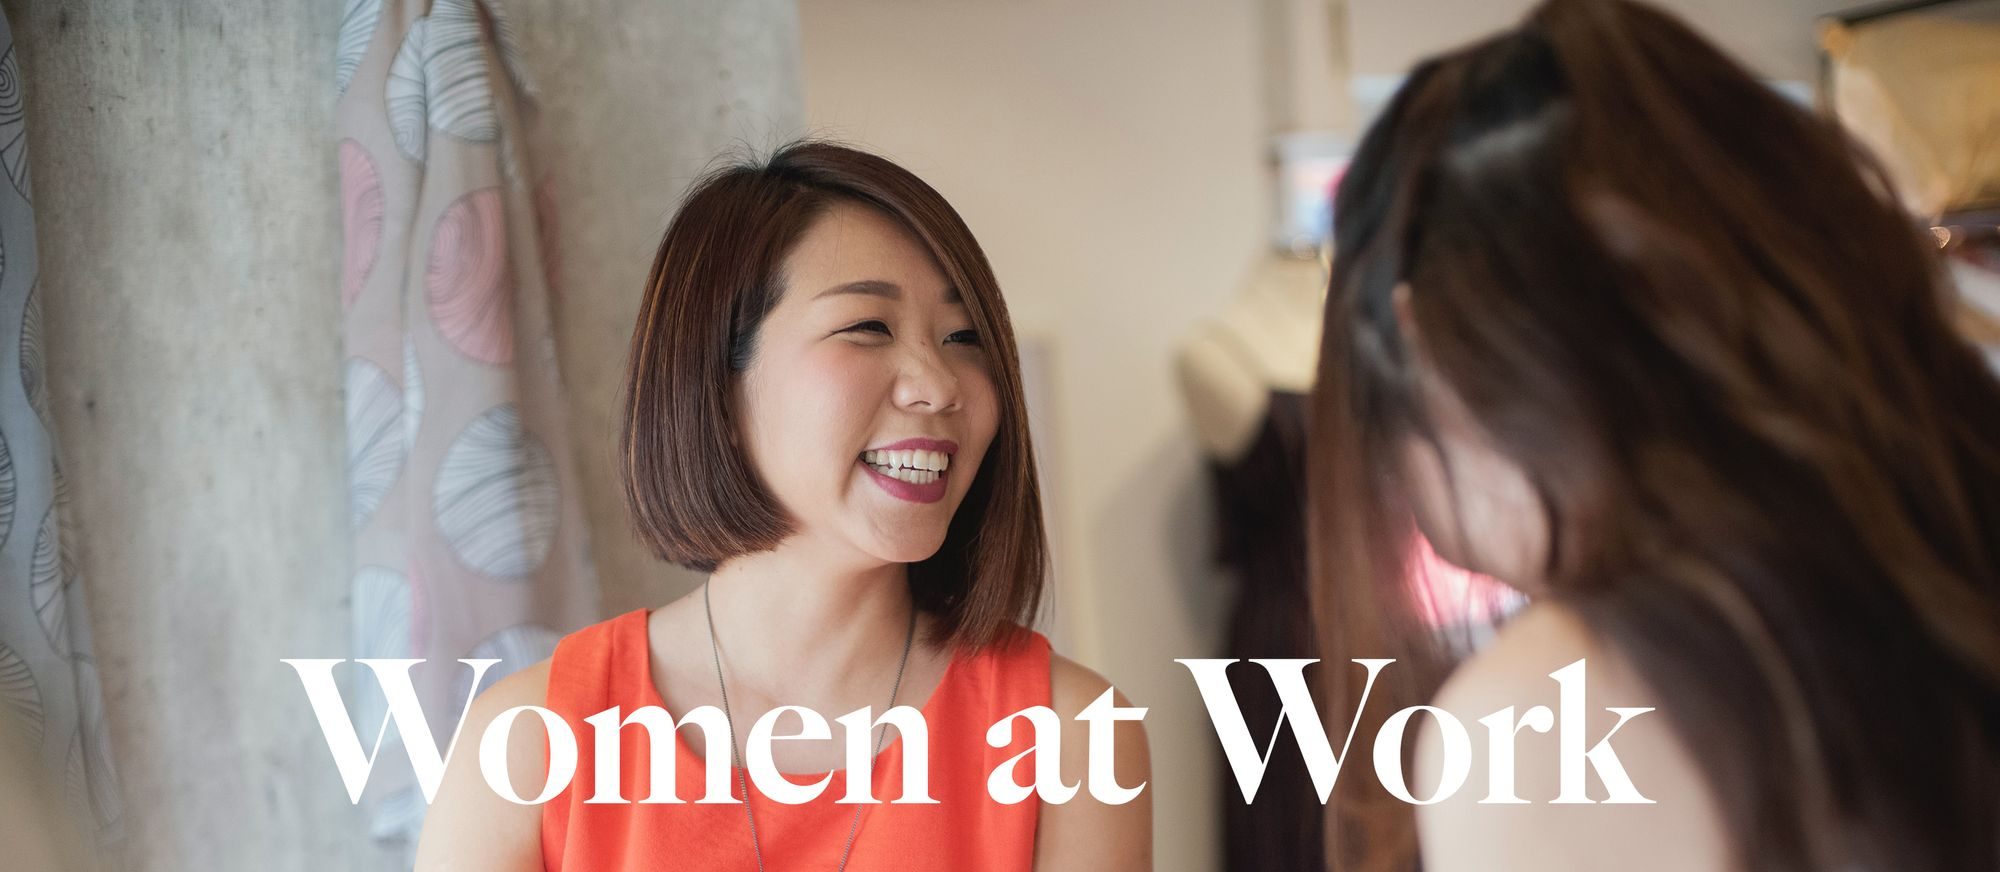 Women at Work - Edition 1